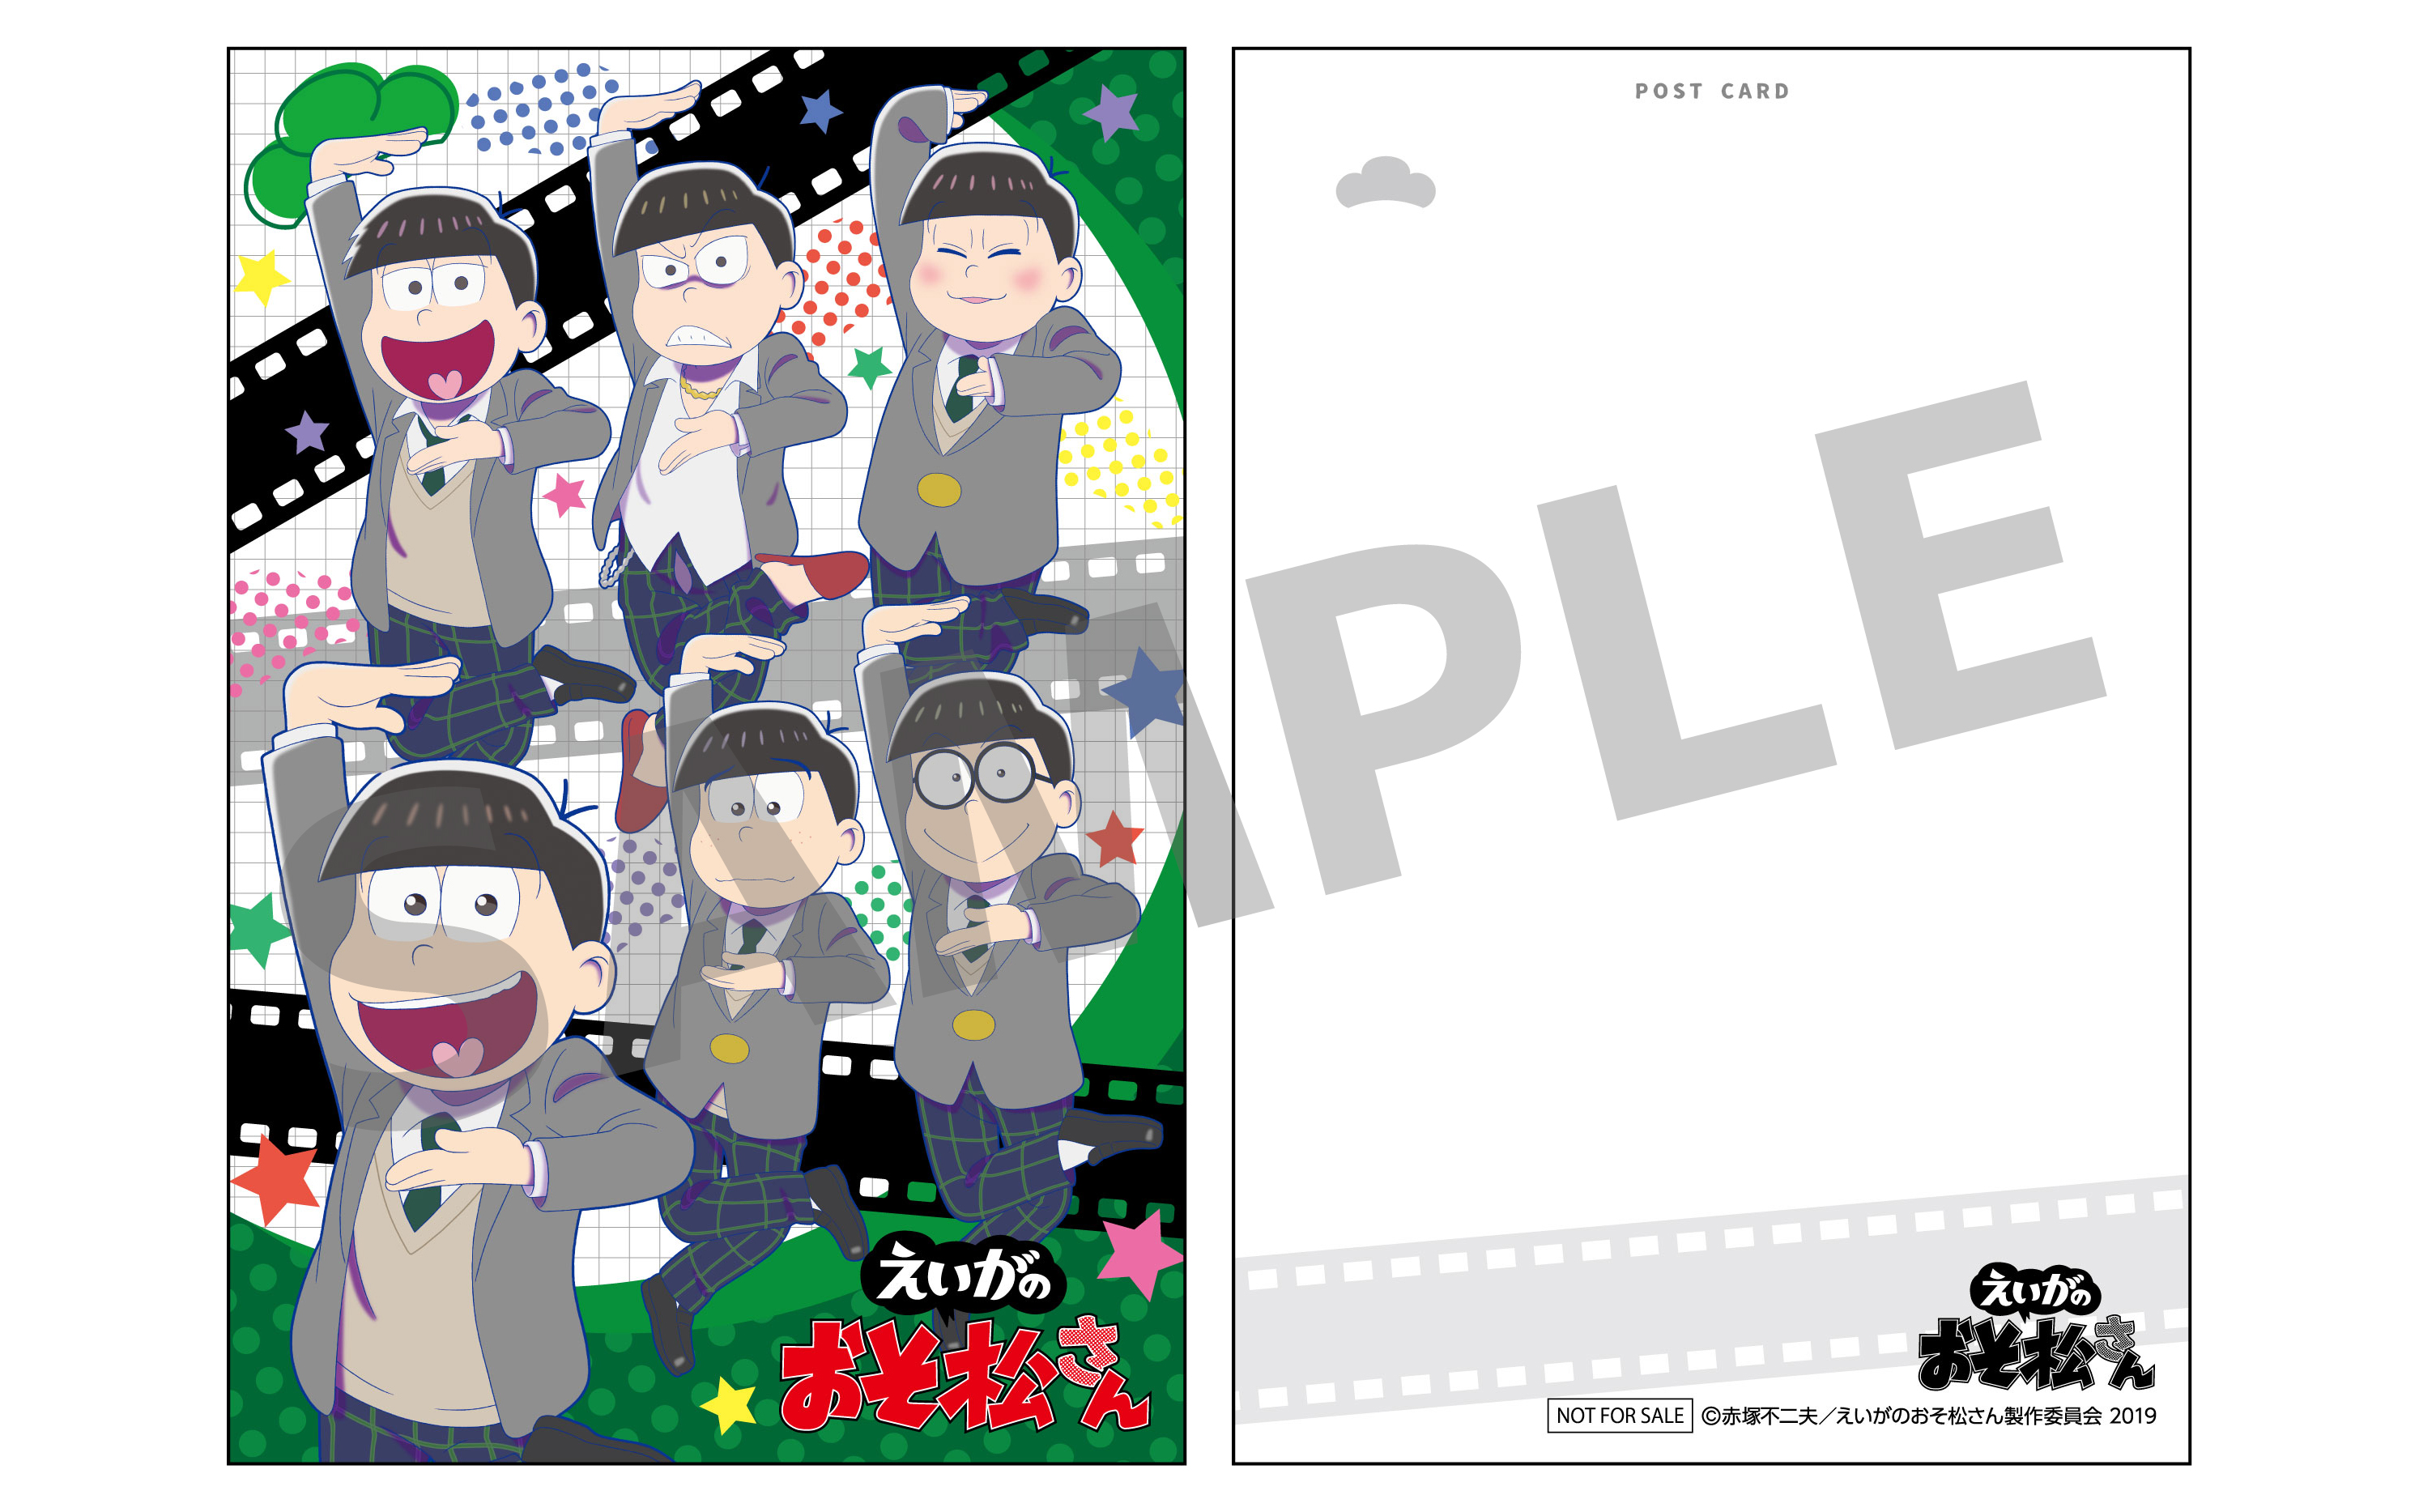 bbbf309800 えいがのおそ松さん × HMV・マルイ コラボレーション 新柄グッズ追加 ...